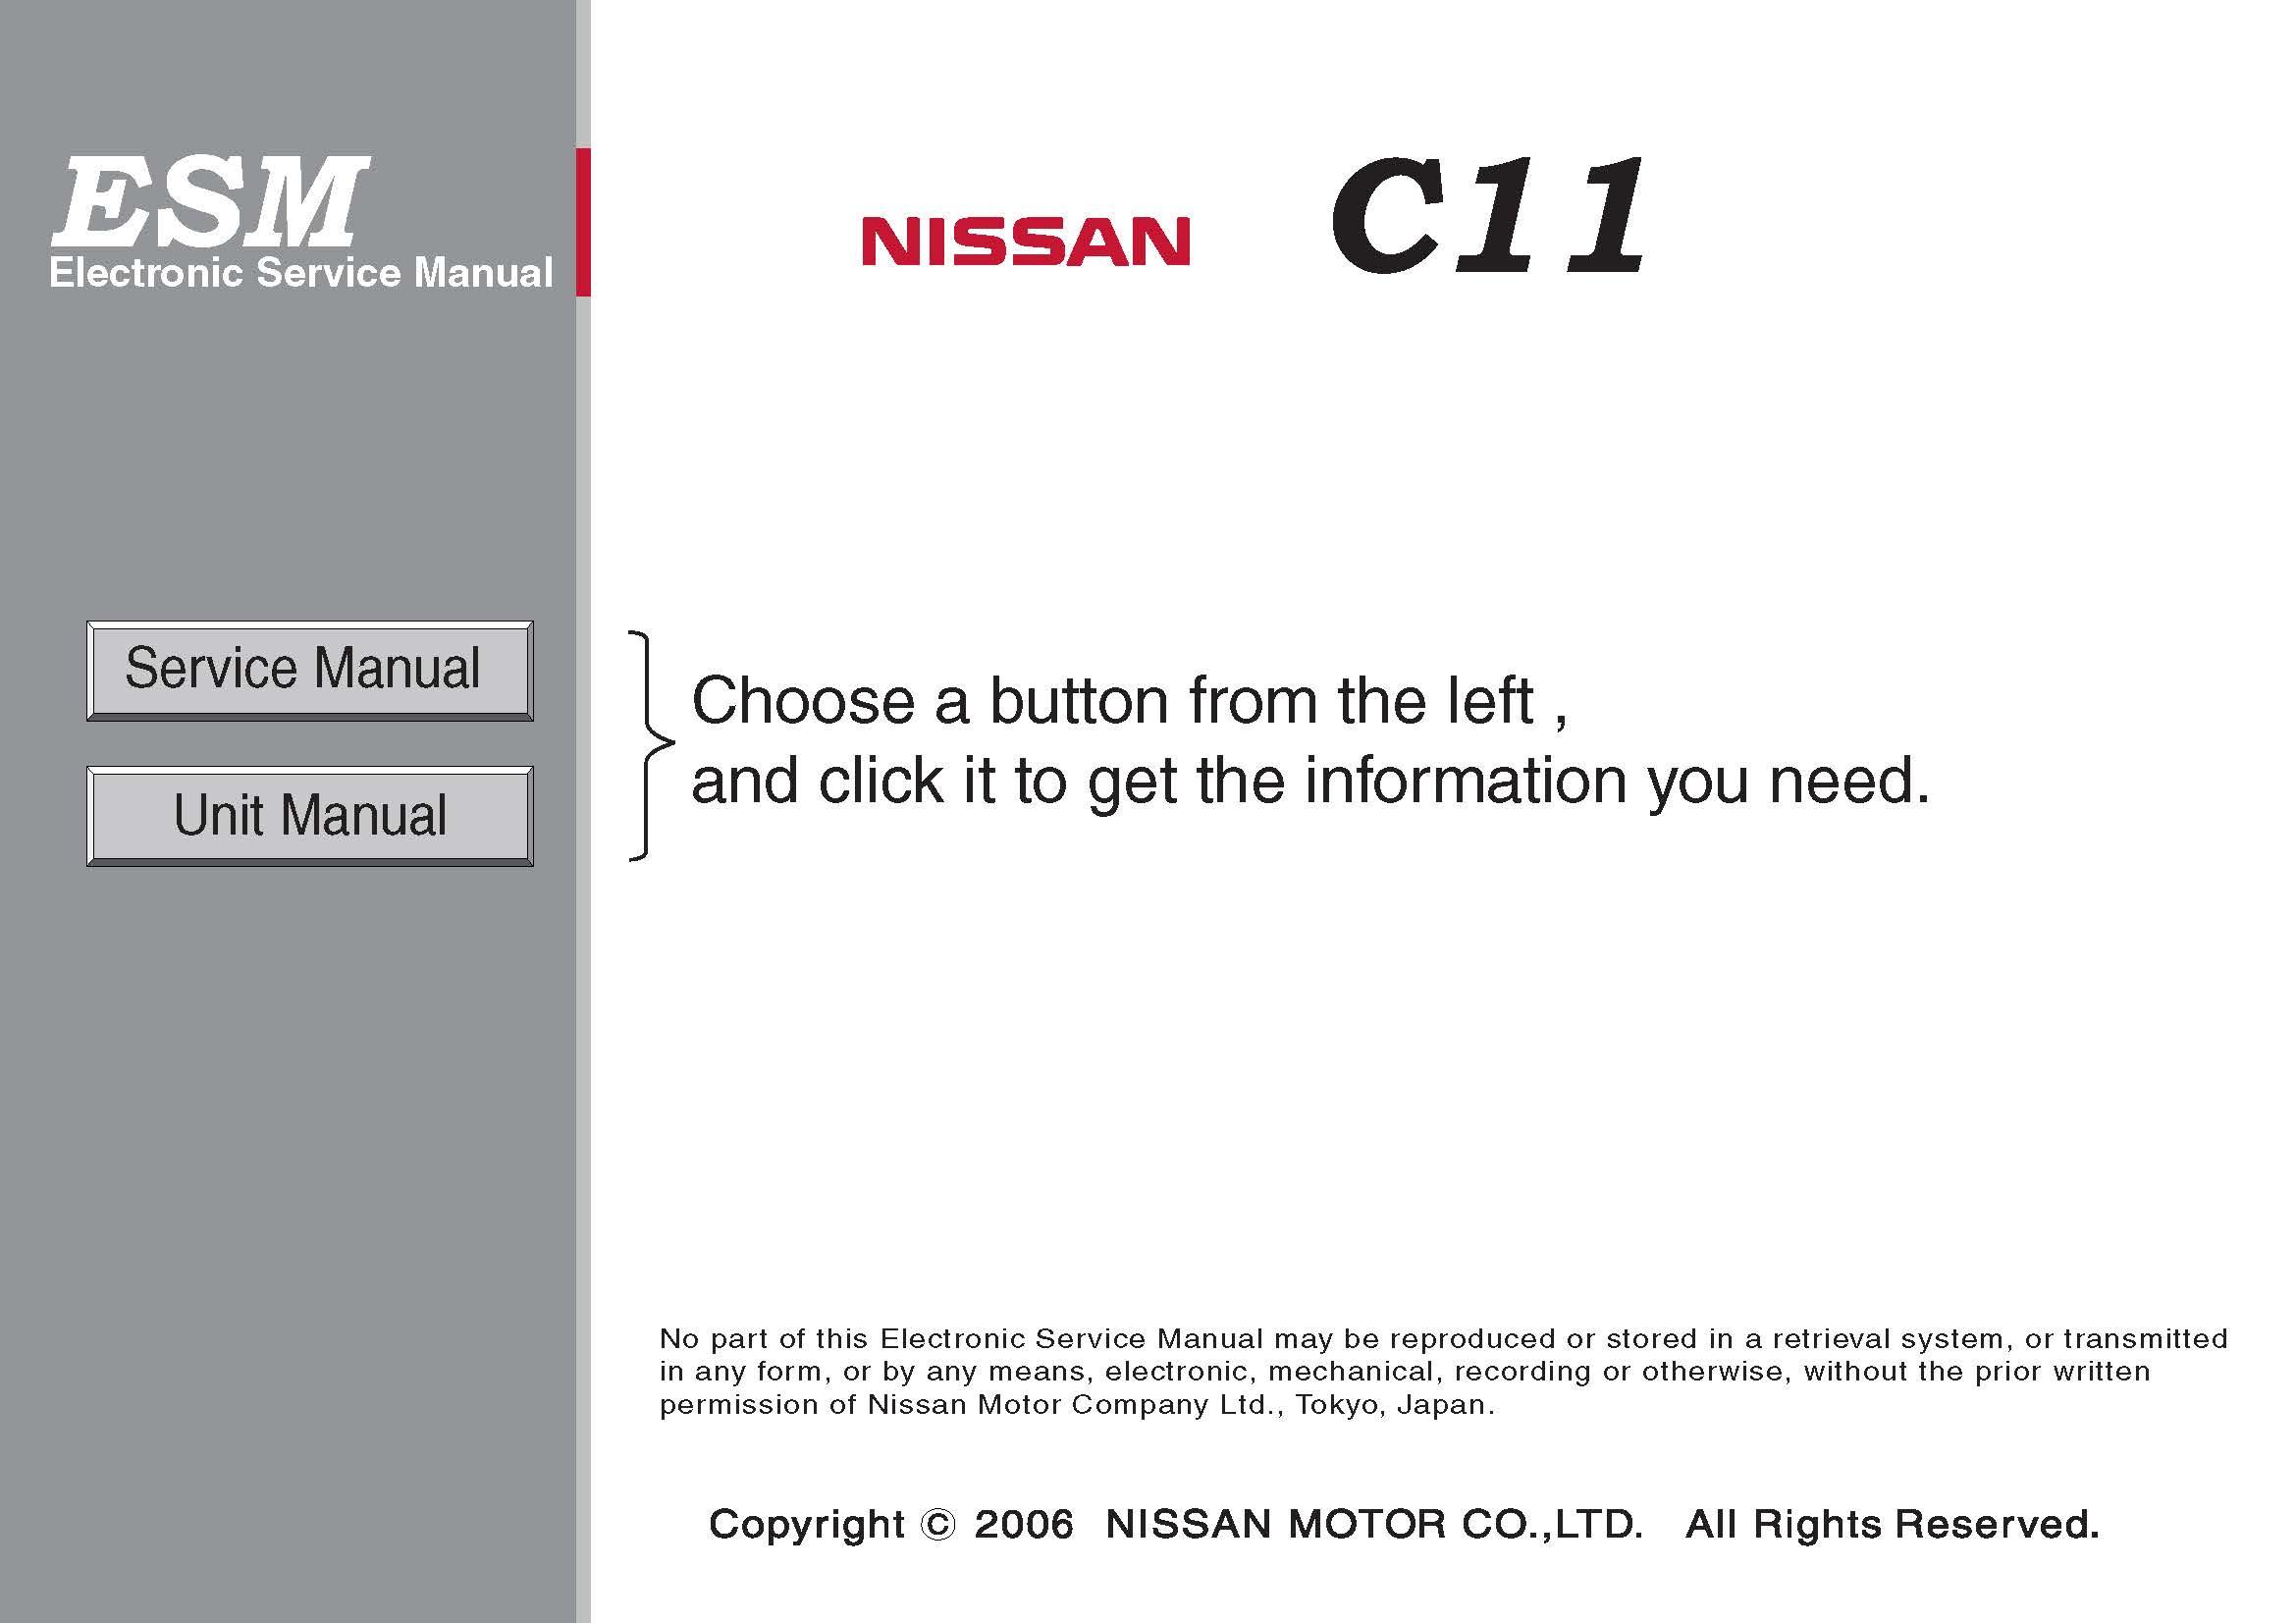 CD คู่มือซ่อม วงจรไฟฟ้า Wiring Diagram รหัสปัญหา (DTC) Nissan TIIDA C11-MR18DE 2005-2006 (EN) ทั้งคัน